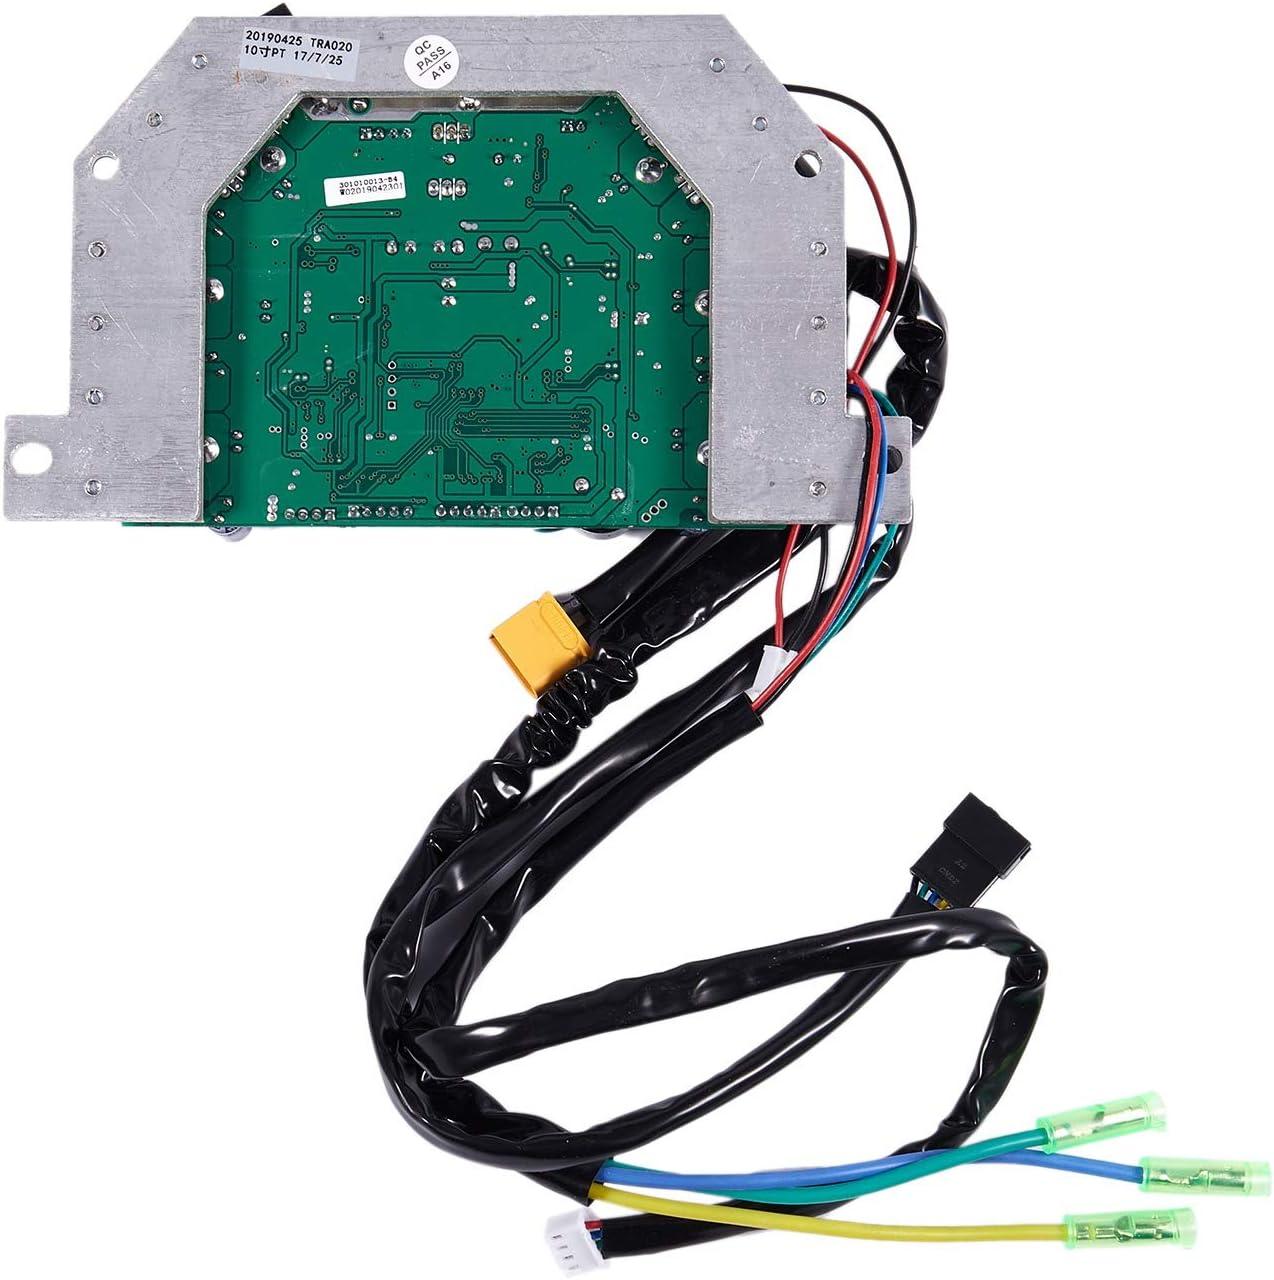 TreadmillPartsZone Replacement for Treadmill Model RBTL18920 Reebok RX8200 Motor Belt Part 106939